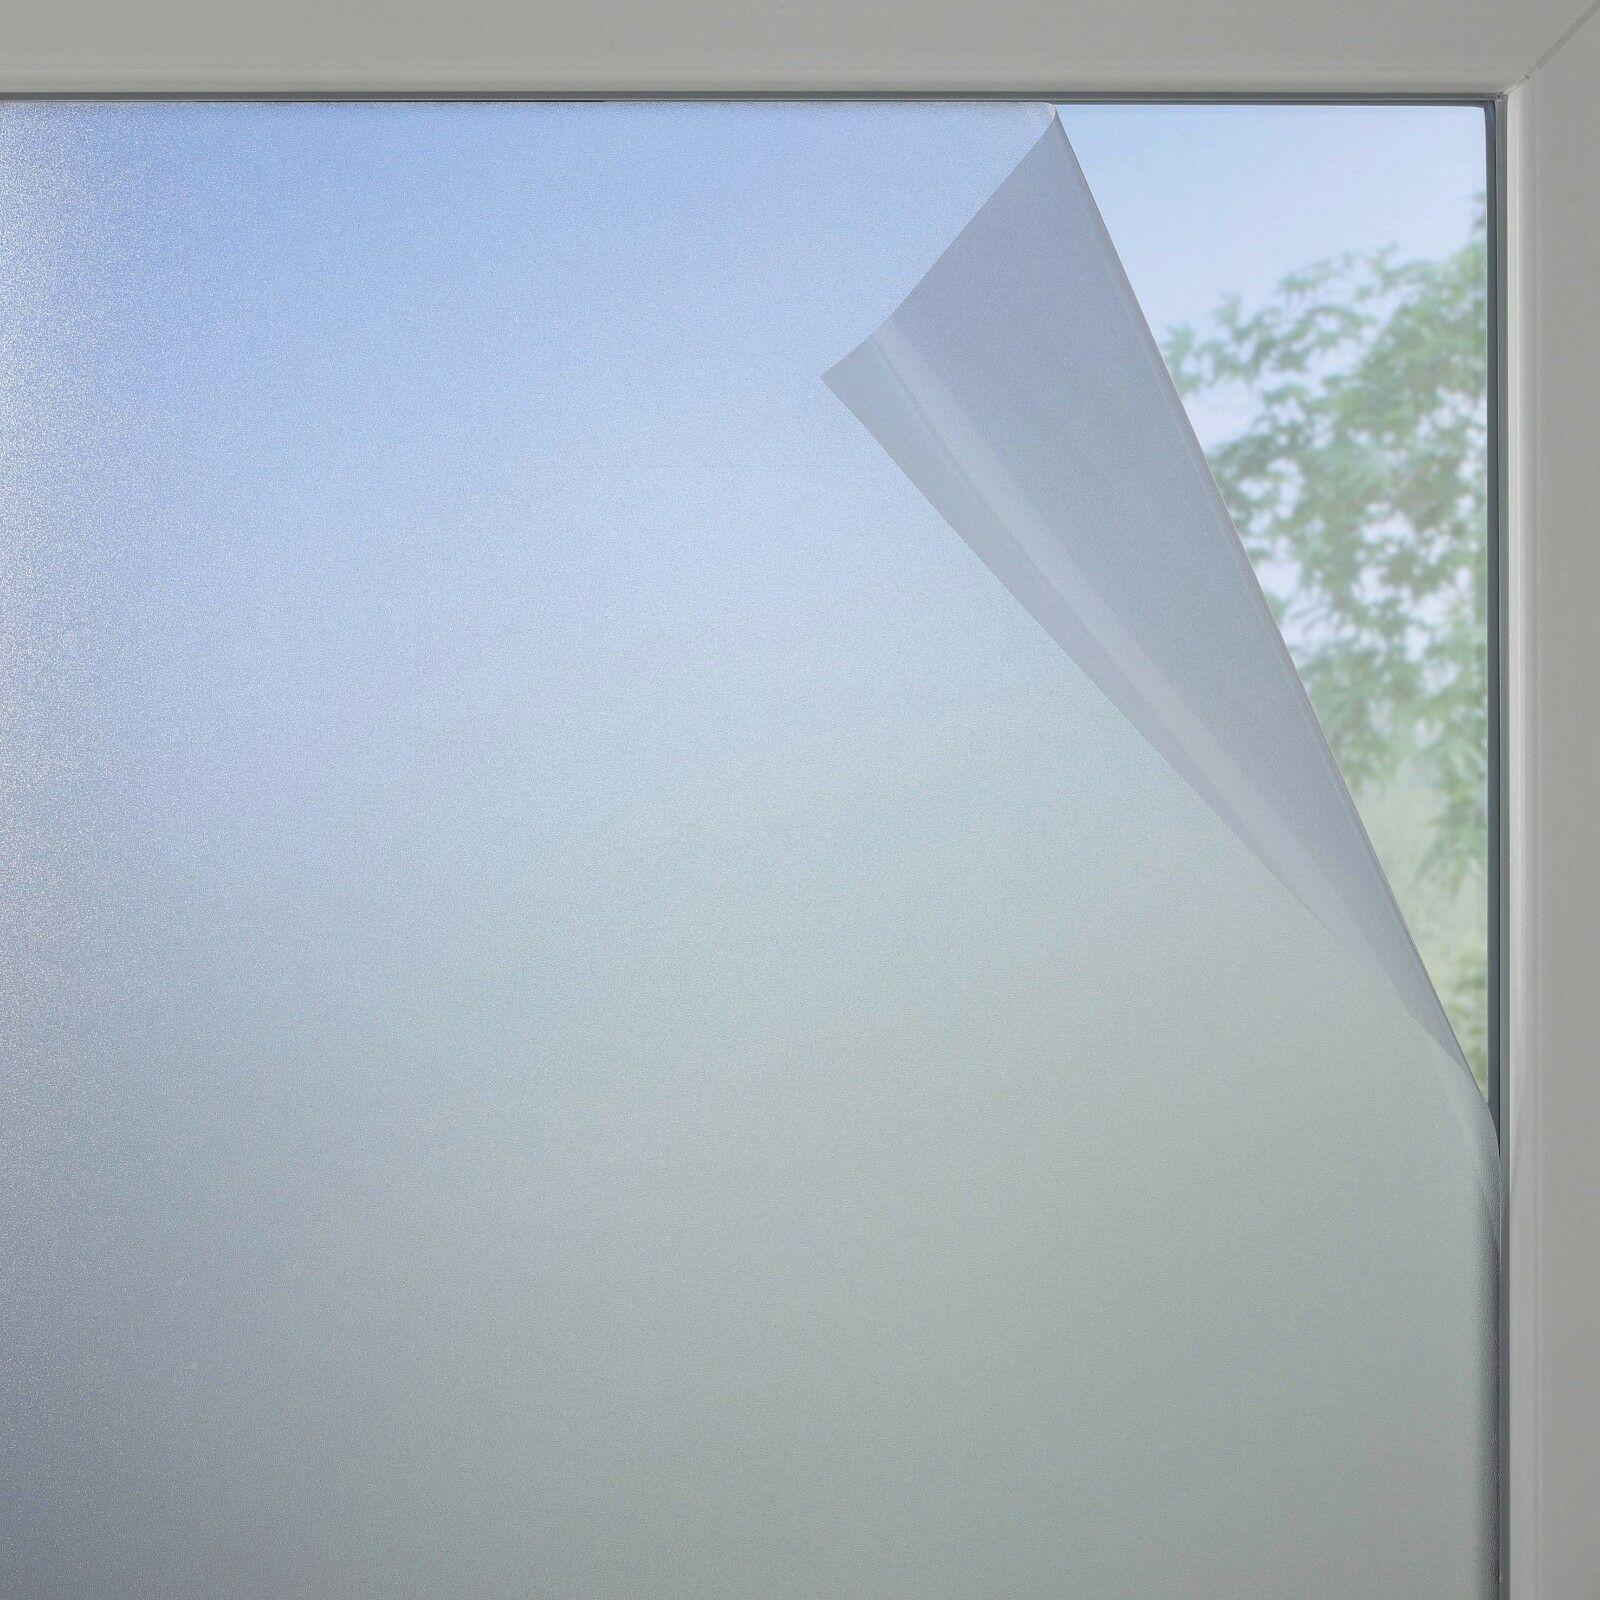 Full Size of Fensterfolie Selbstklebend Milchglasfolie Blickdicht Wohnzimmer Fensterfolie Blickdicht